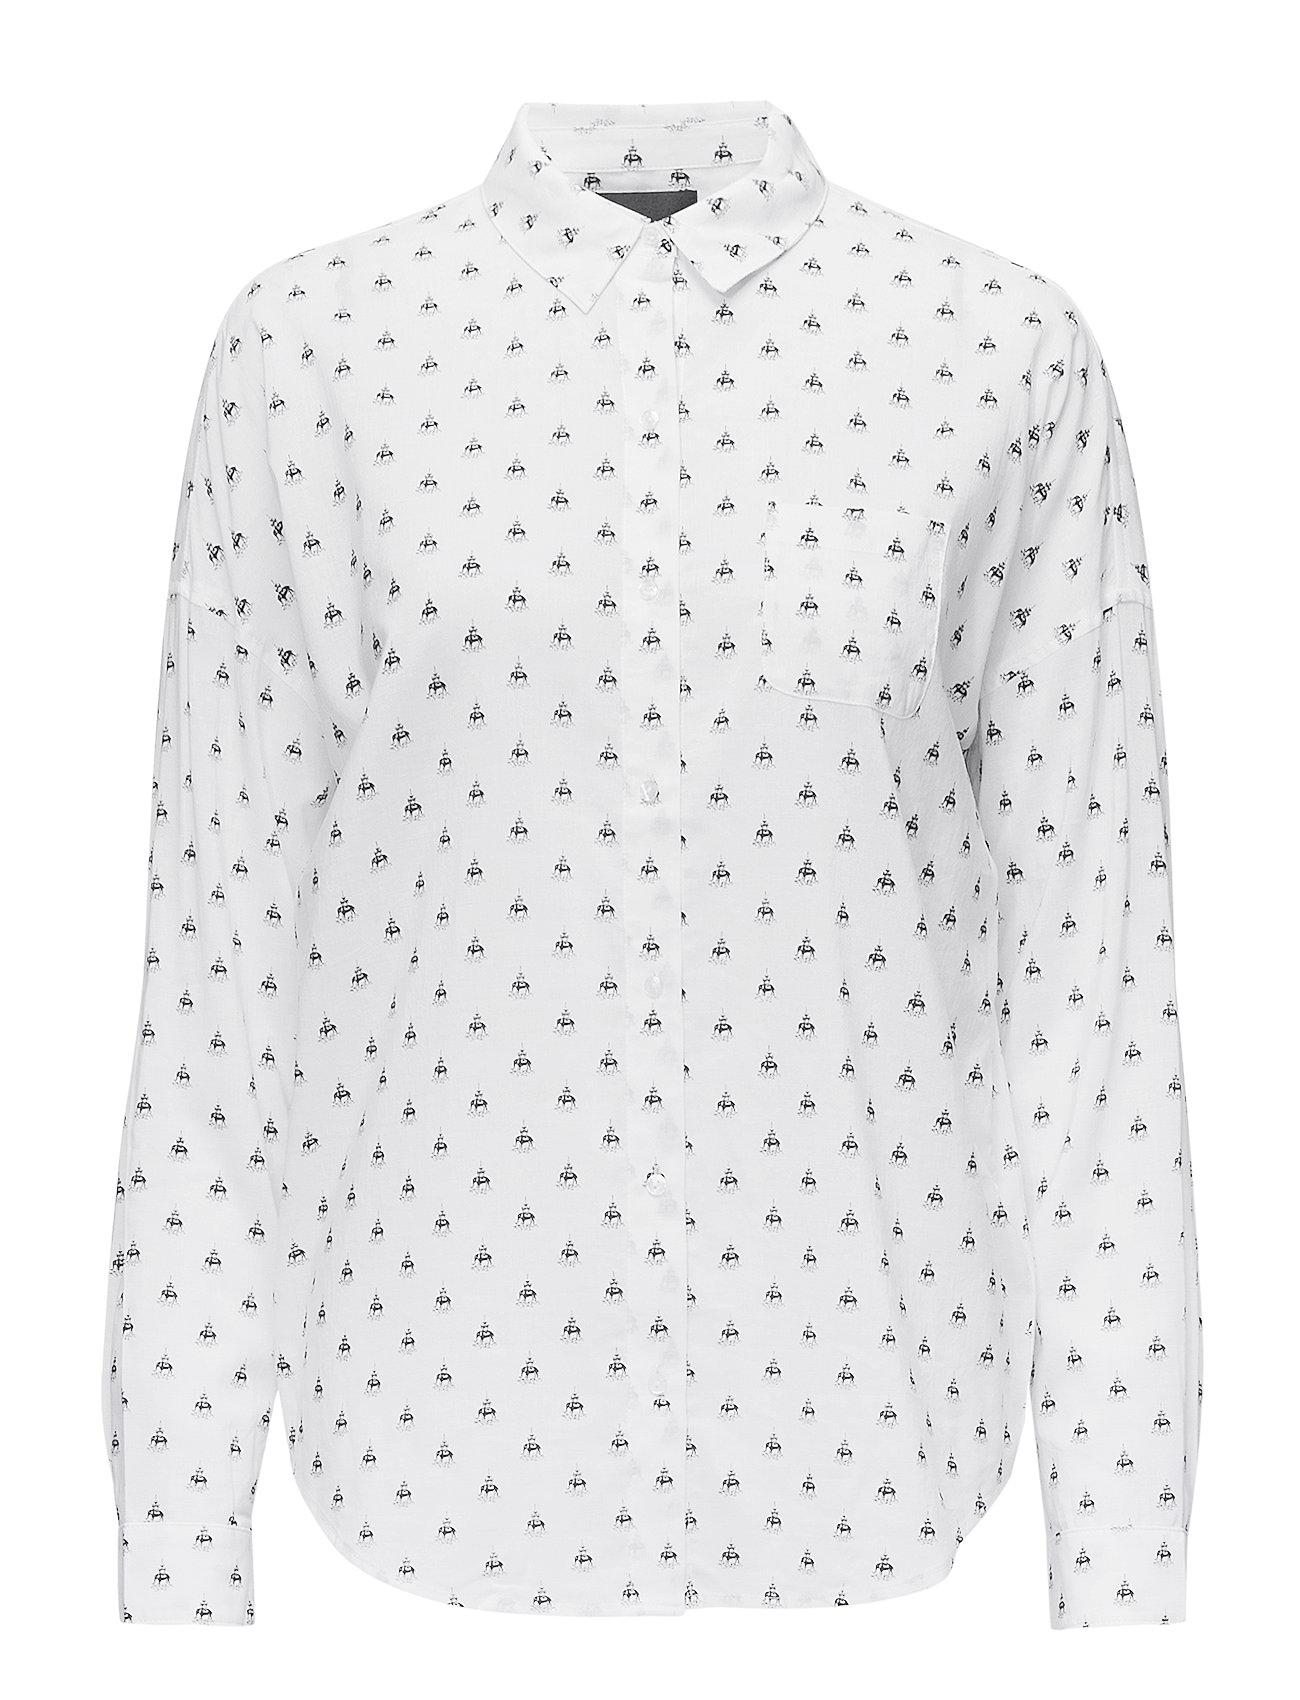 Scotch & Soda Oversized boxy fit cotton viscose shirt in various prints - COMBO M